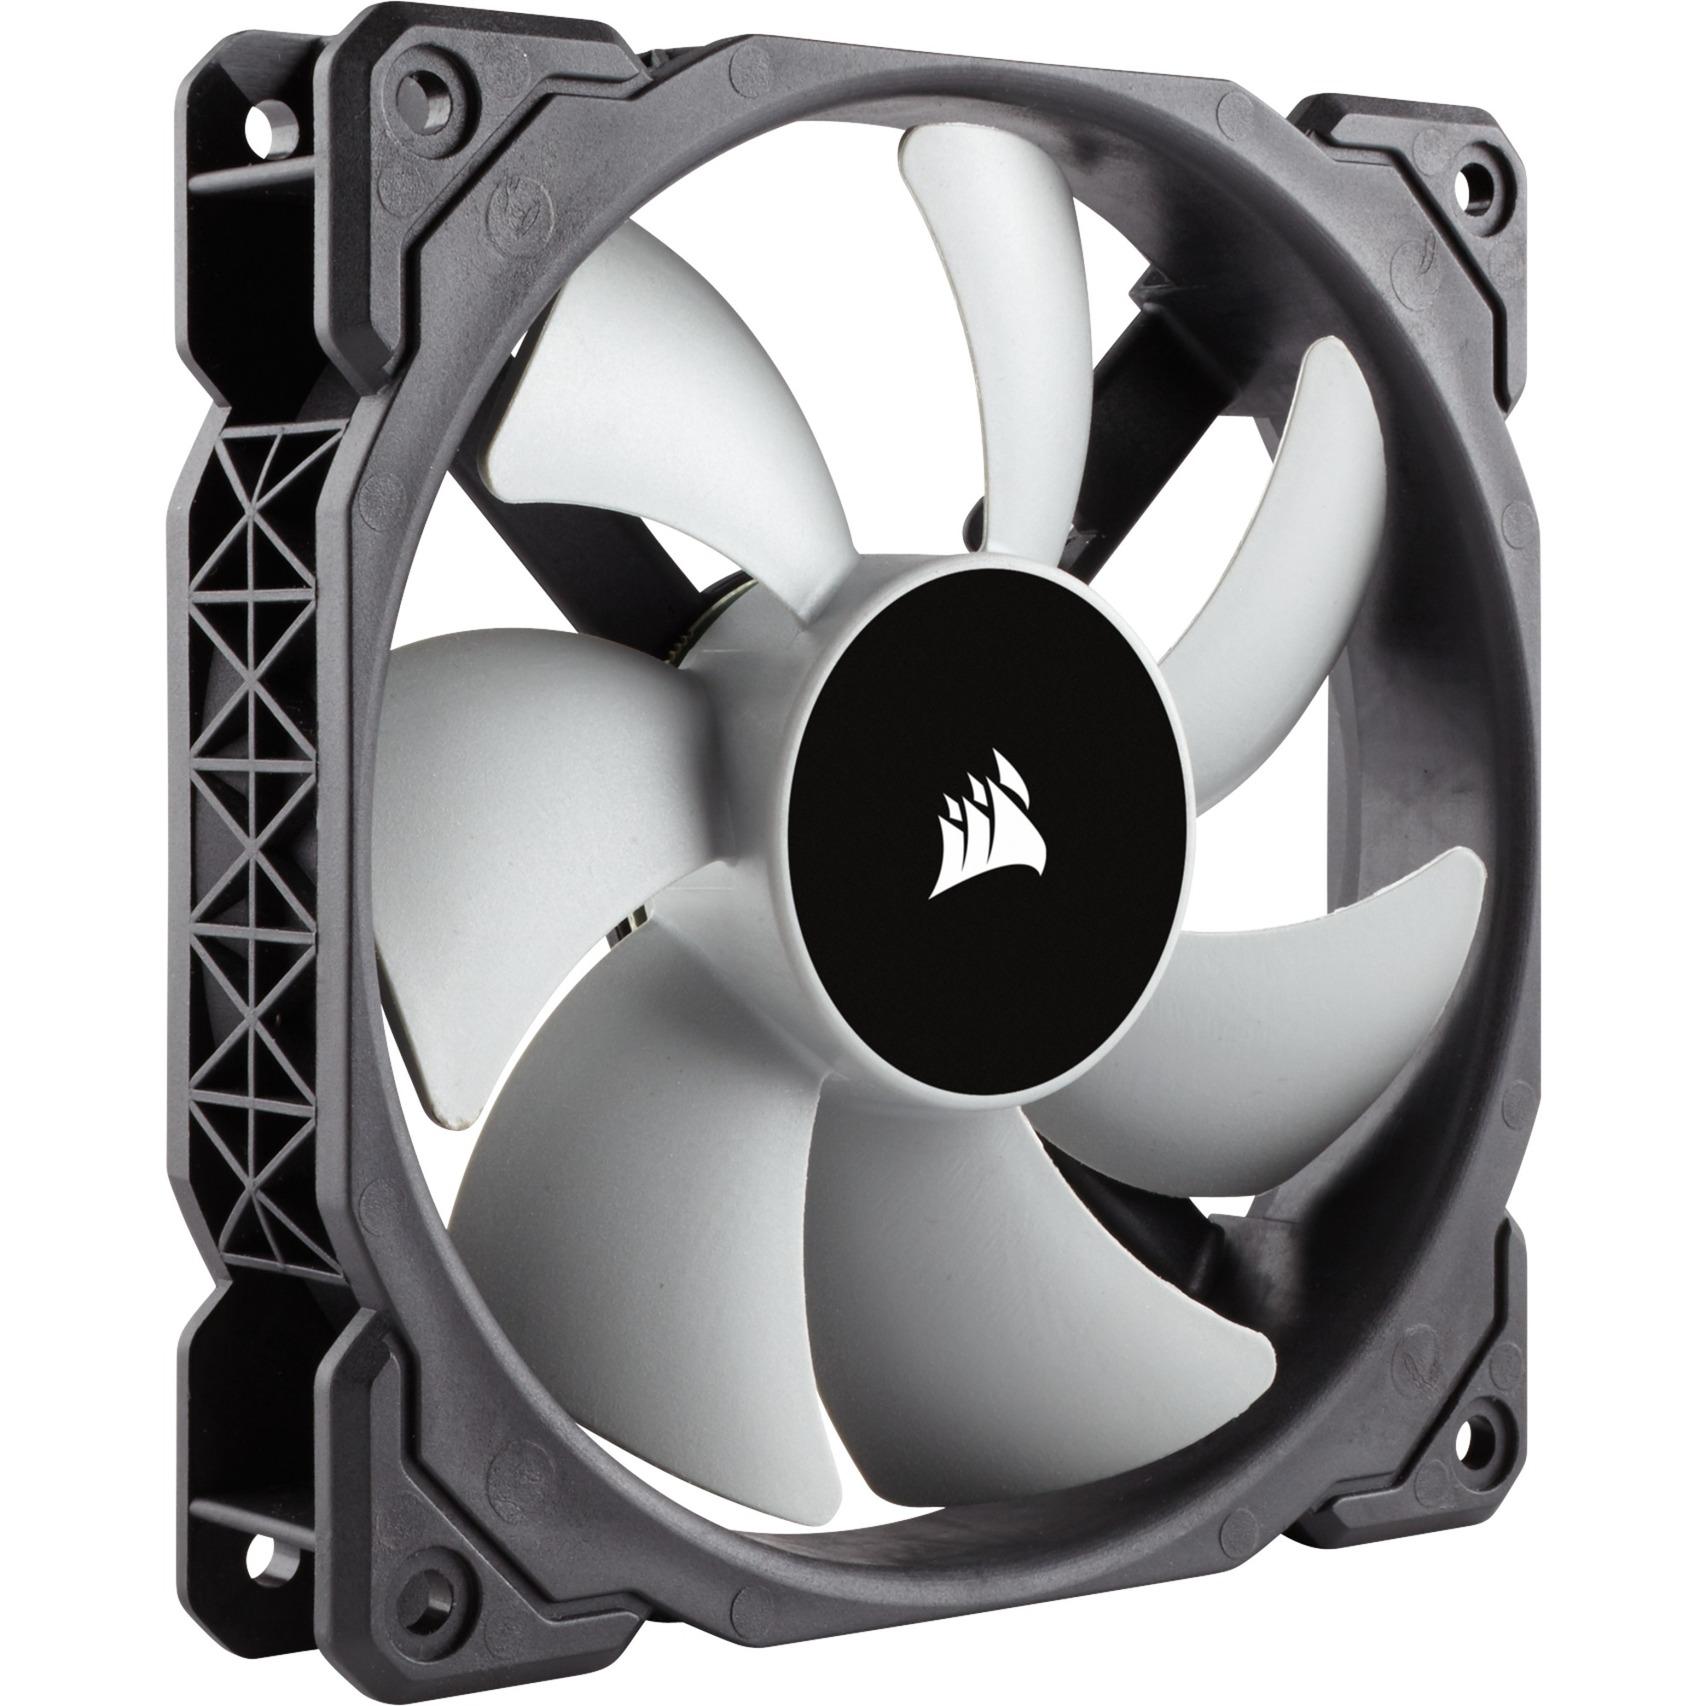 Air ML120 Boitier PC Ventilateur 12 cm Noir, Gris, Ventilateur de boîtier (Noir, Boitier PC, Ventilateur, 12 cm, 400 trmin, 2400 trmin, 16 dB)